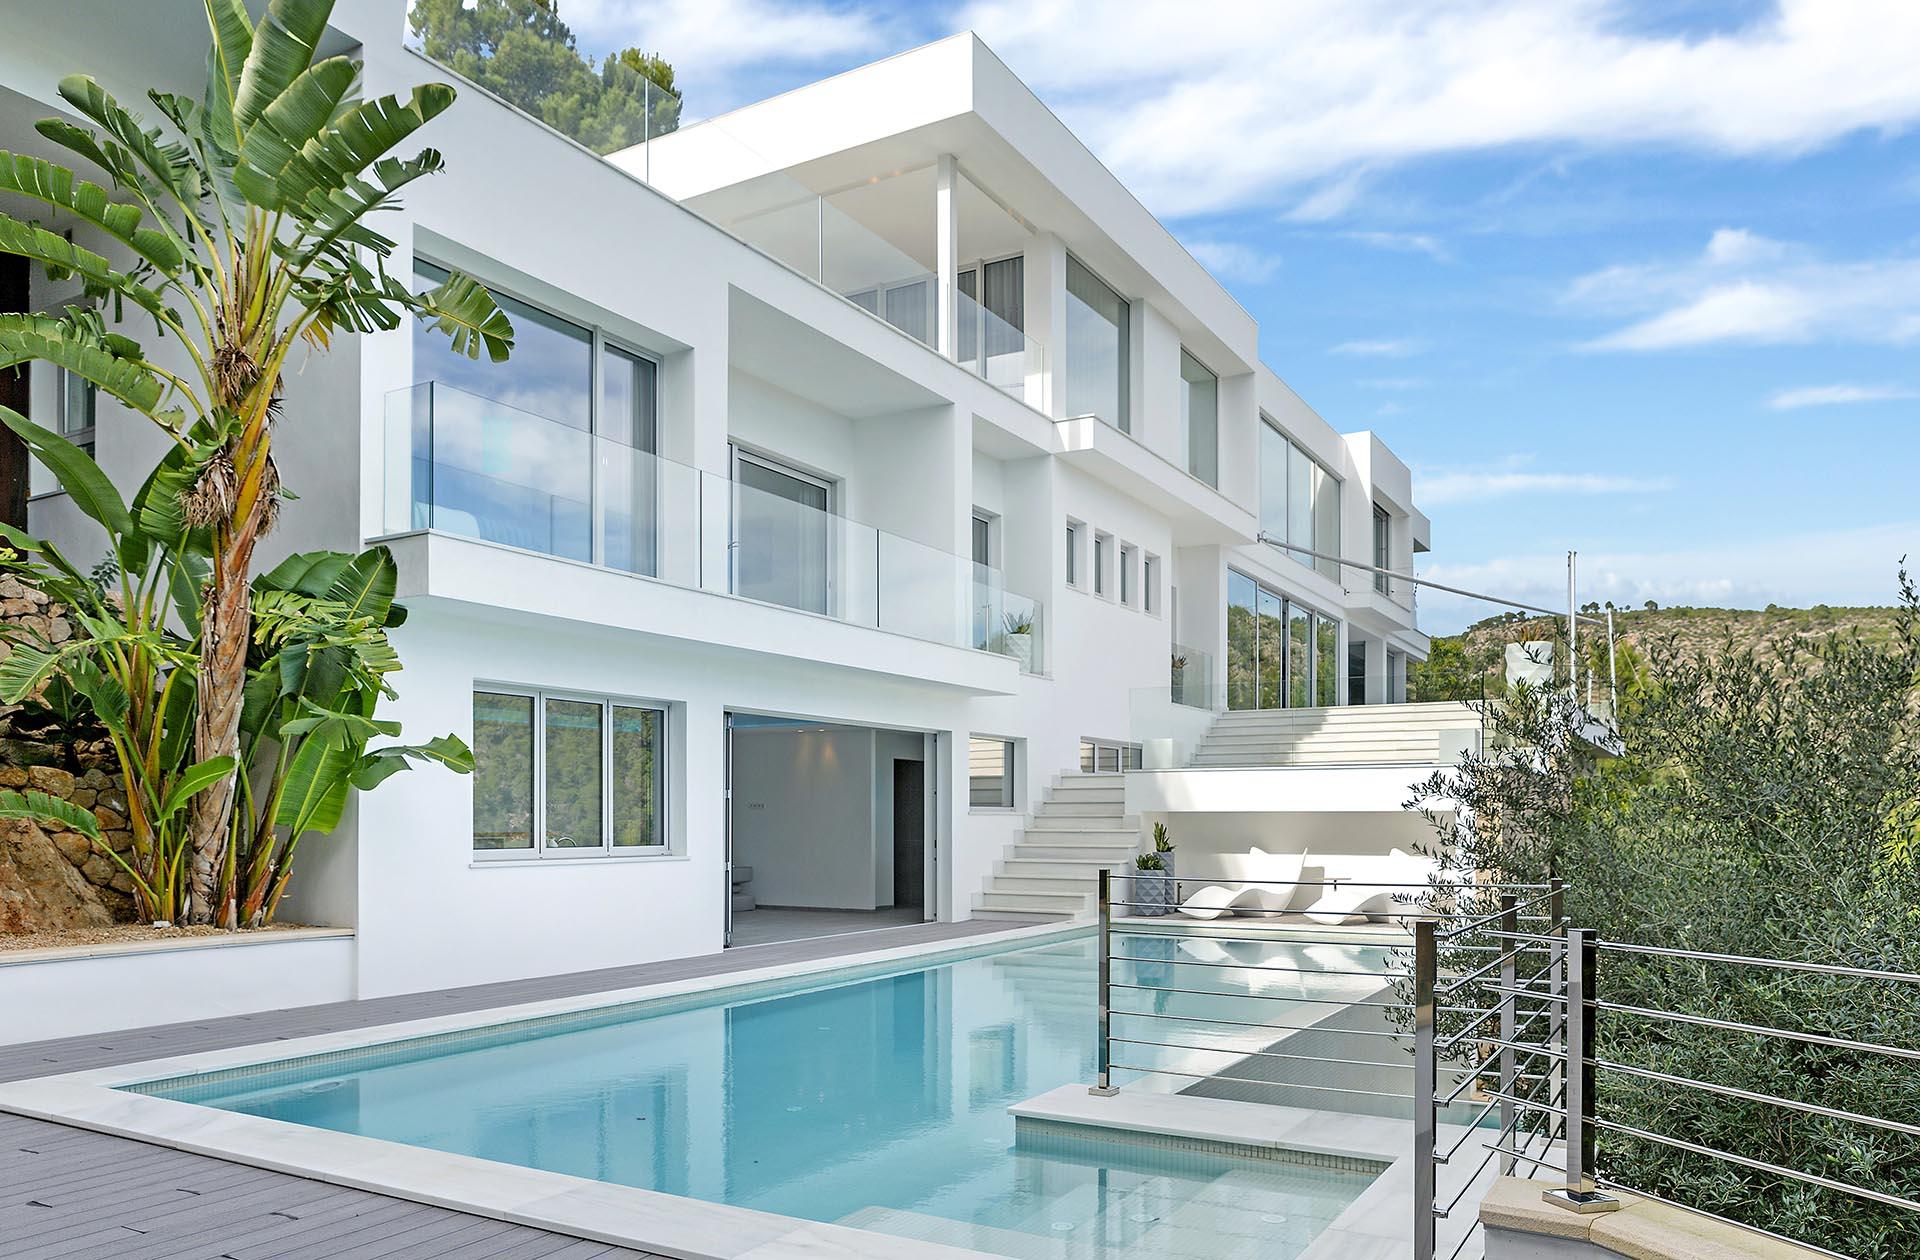 Hermosa villa en Costa d'en Blanes - Fachada exterior con piscina